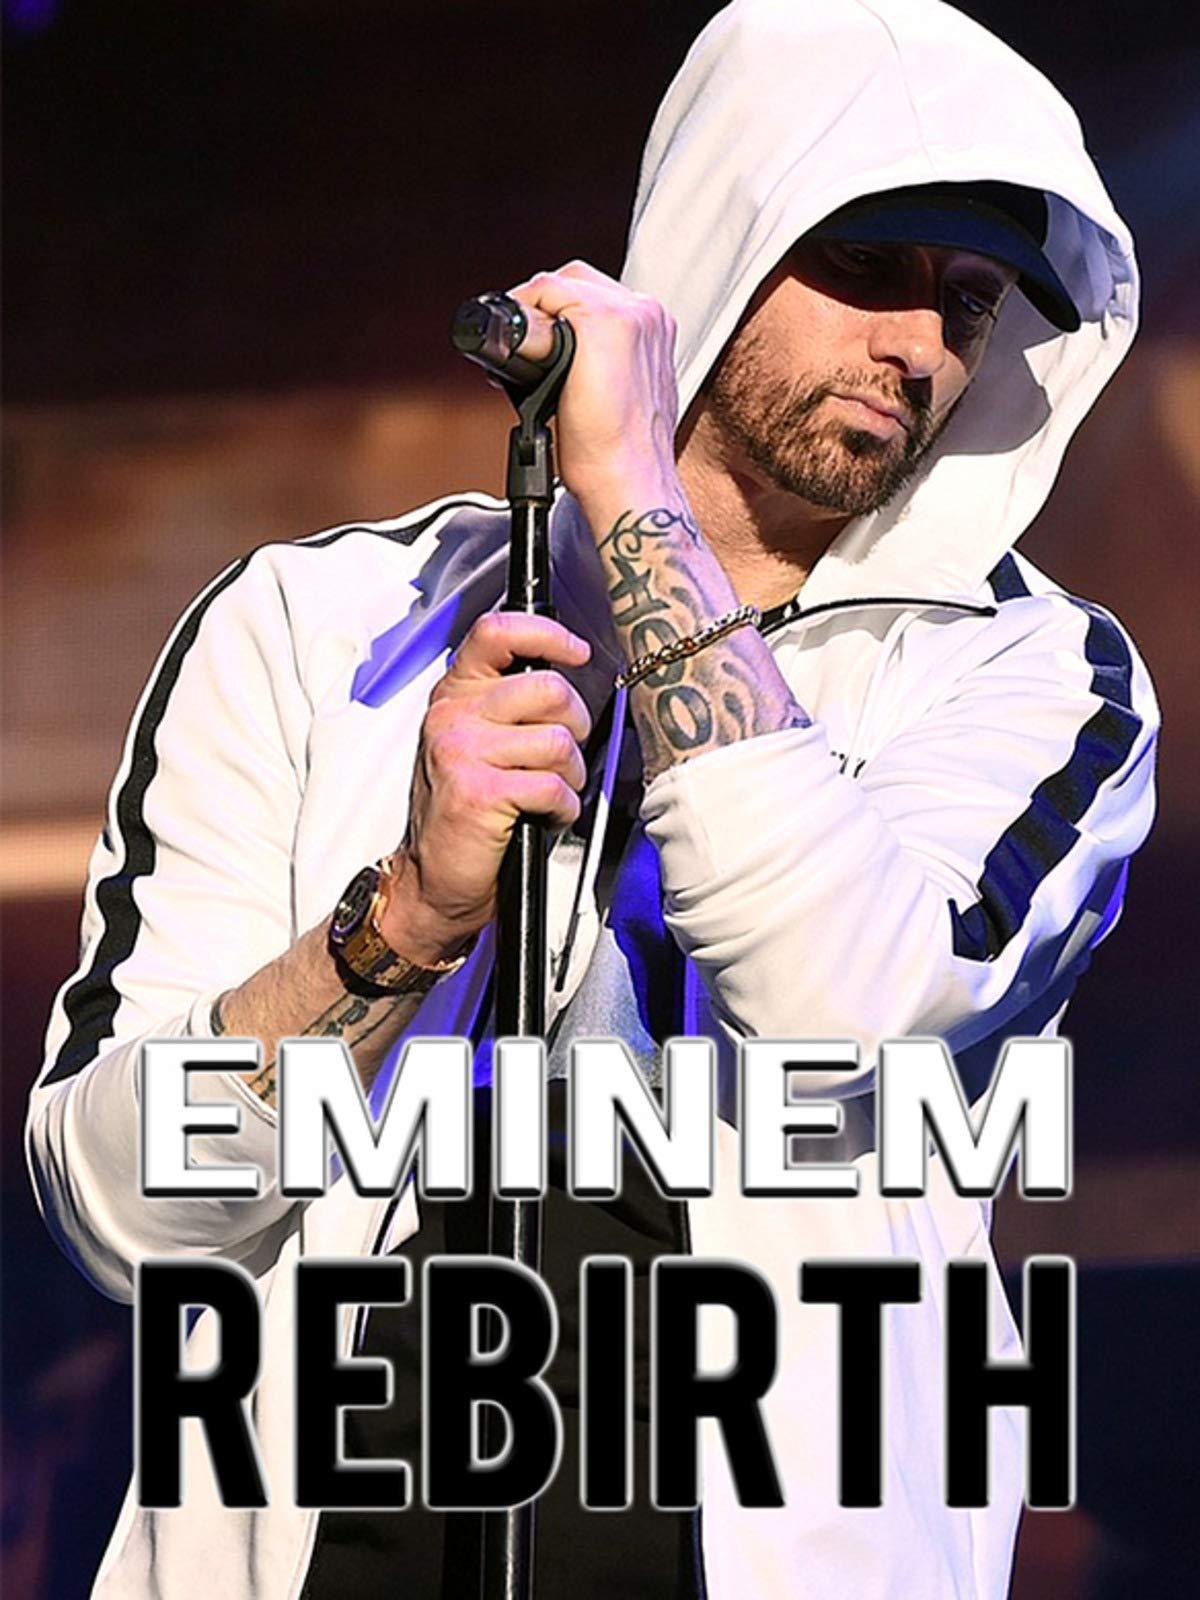 Eminem: Rebirth